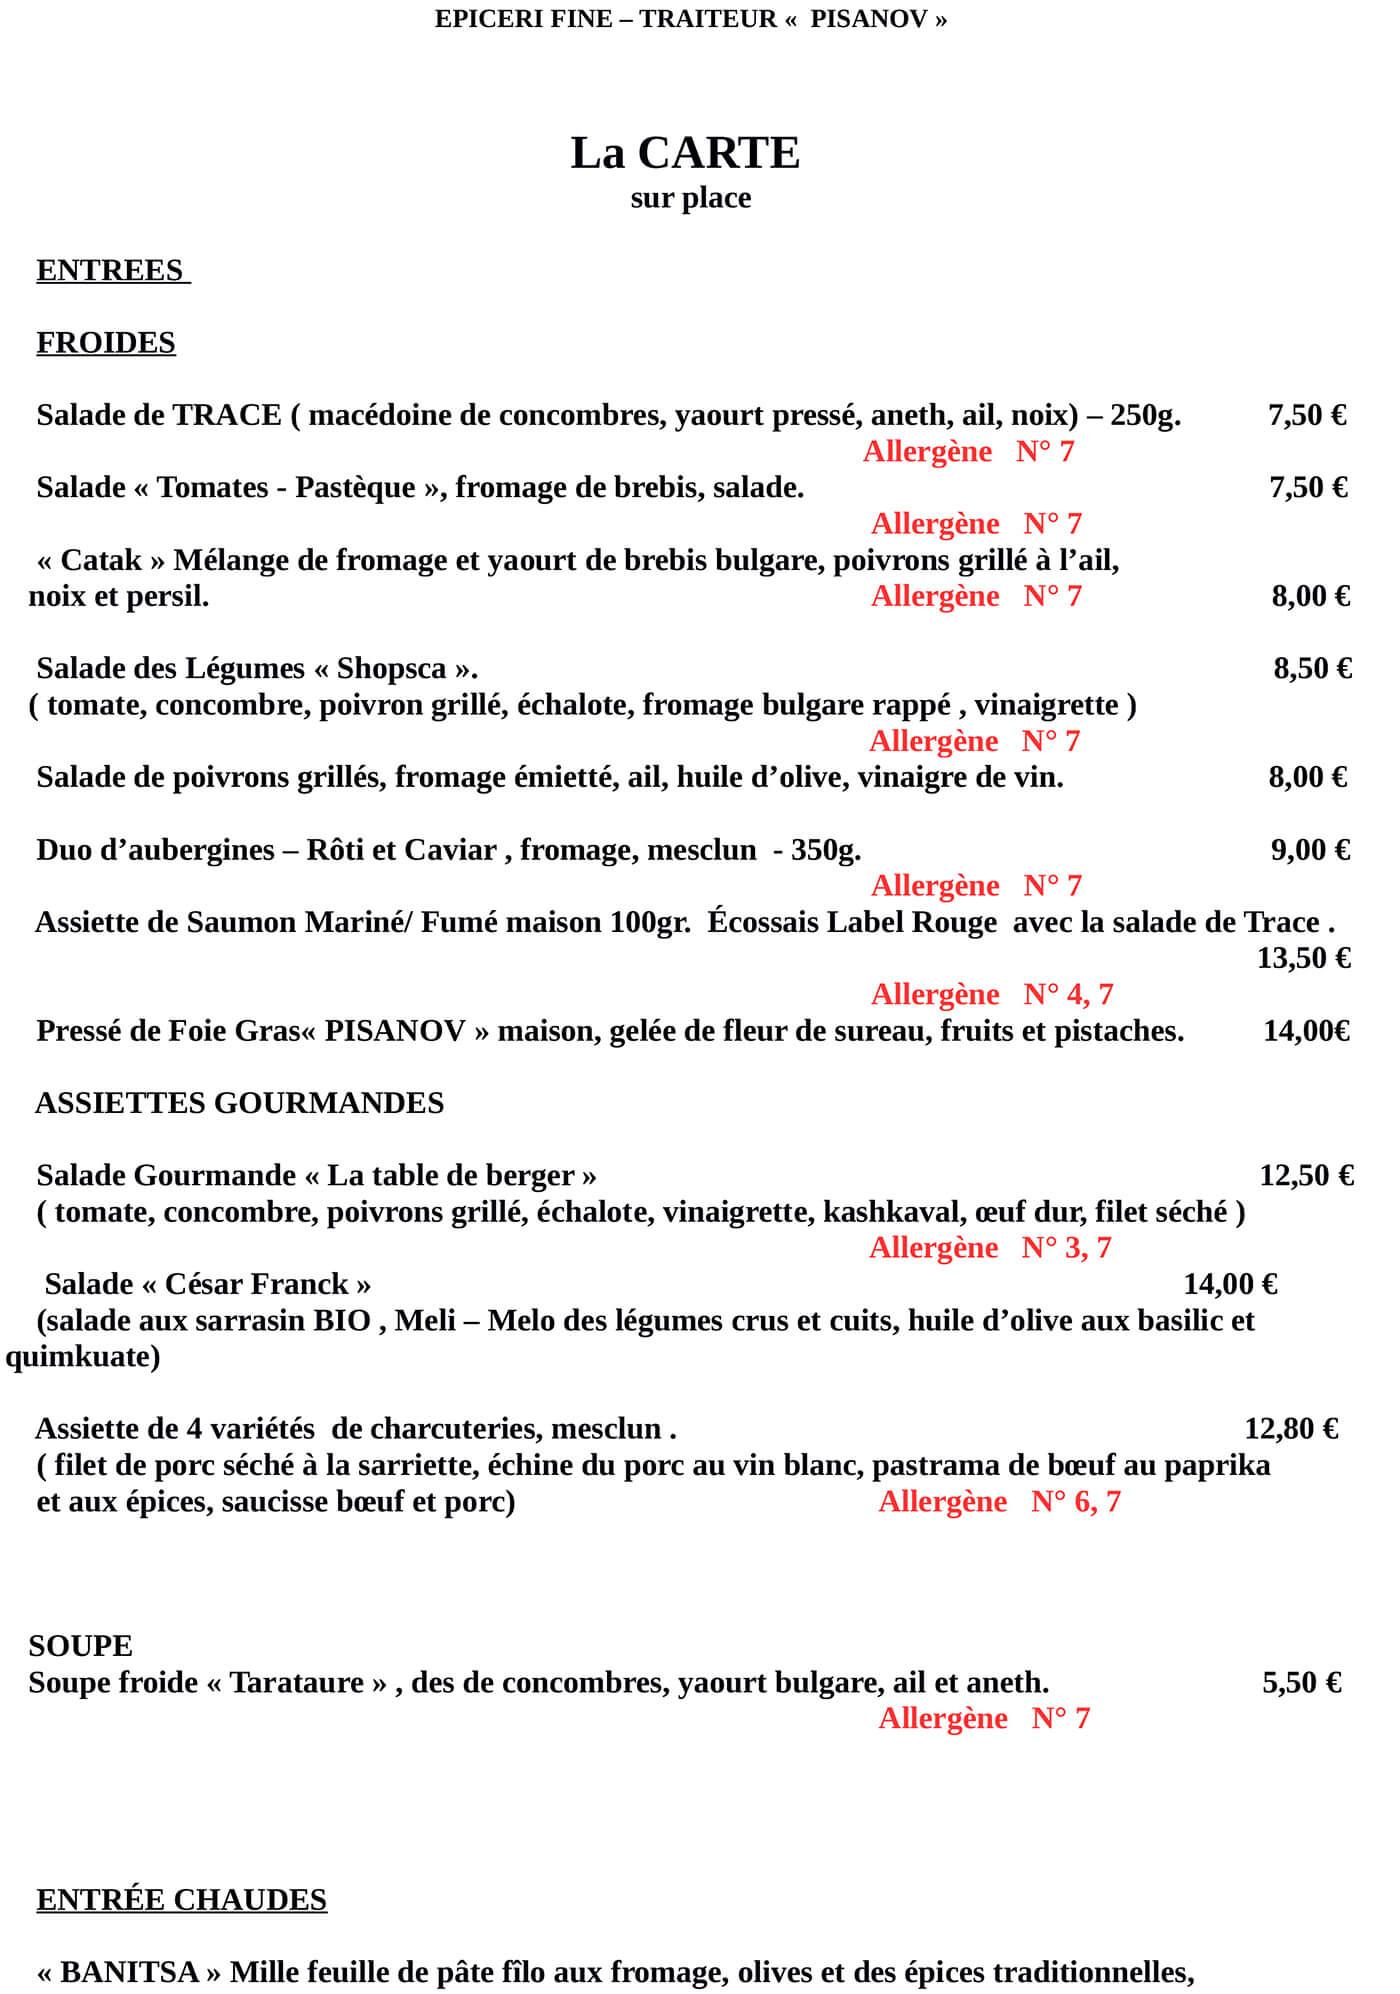 Carte du Restaurant Pisanov - 6 Rue César Franck, 75015 Paris